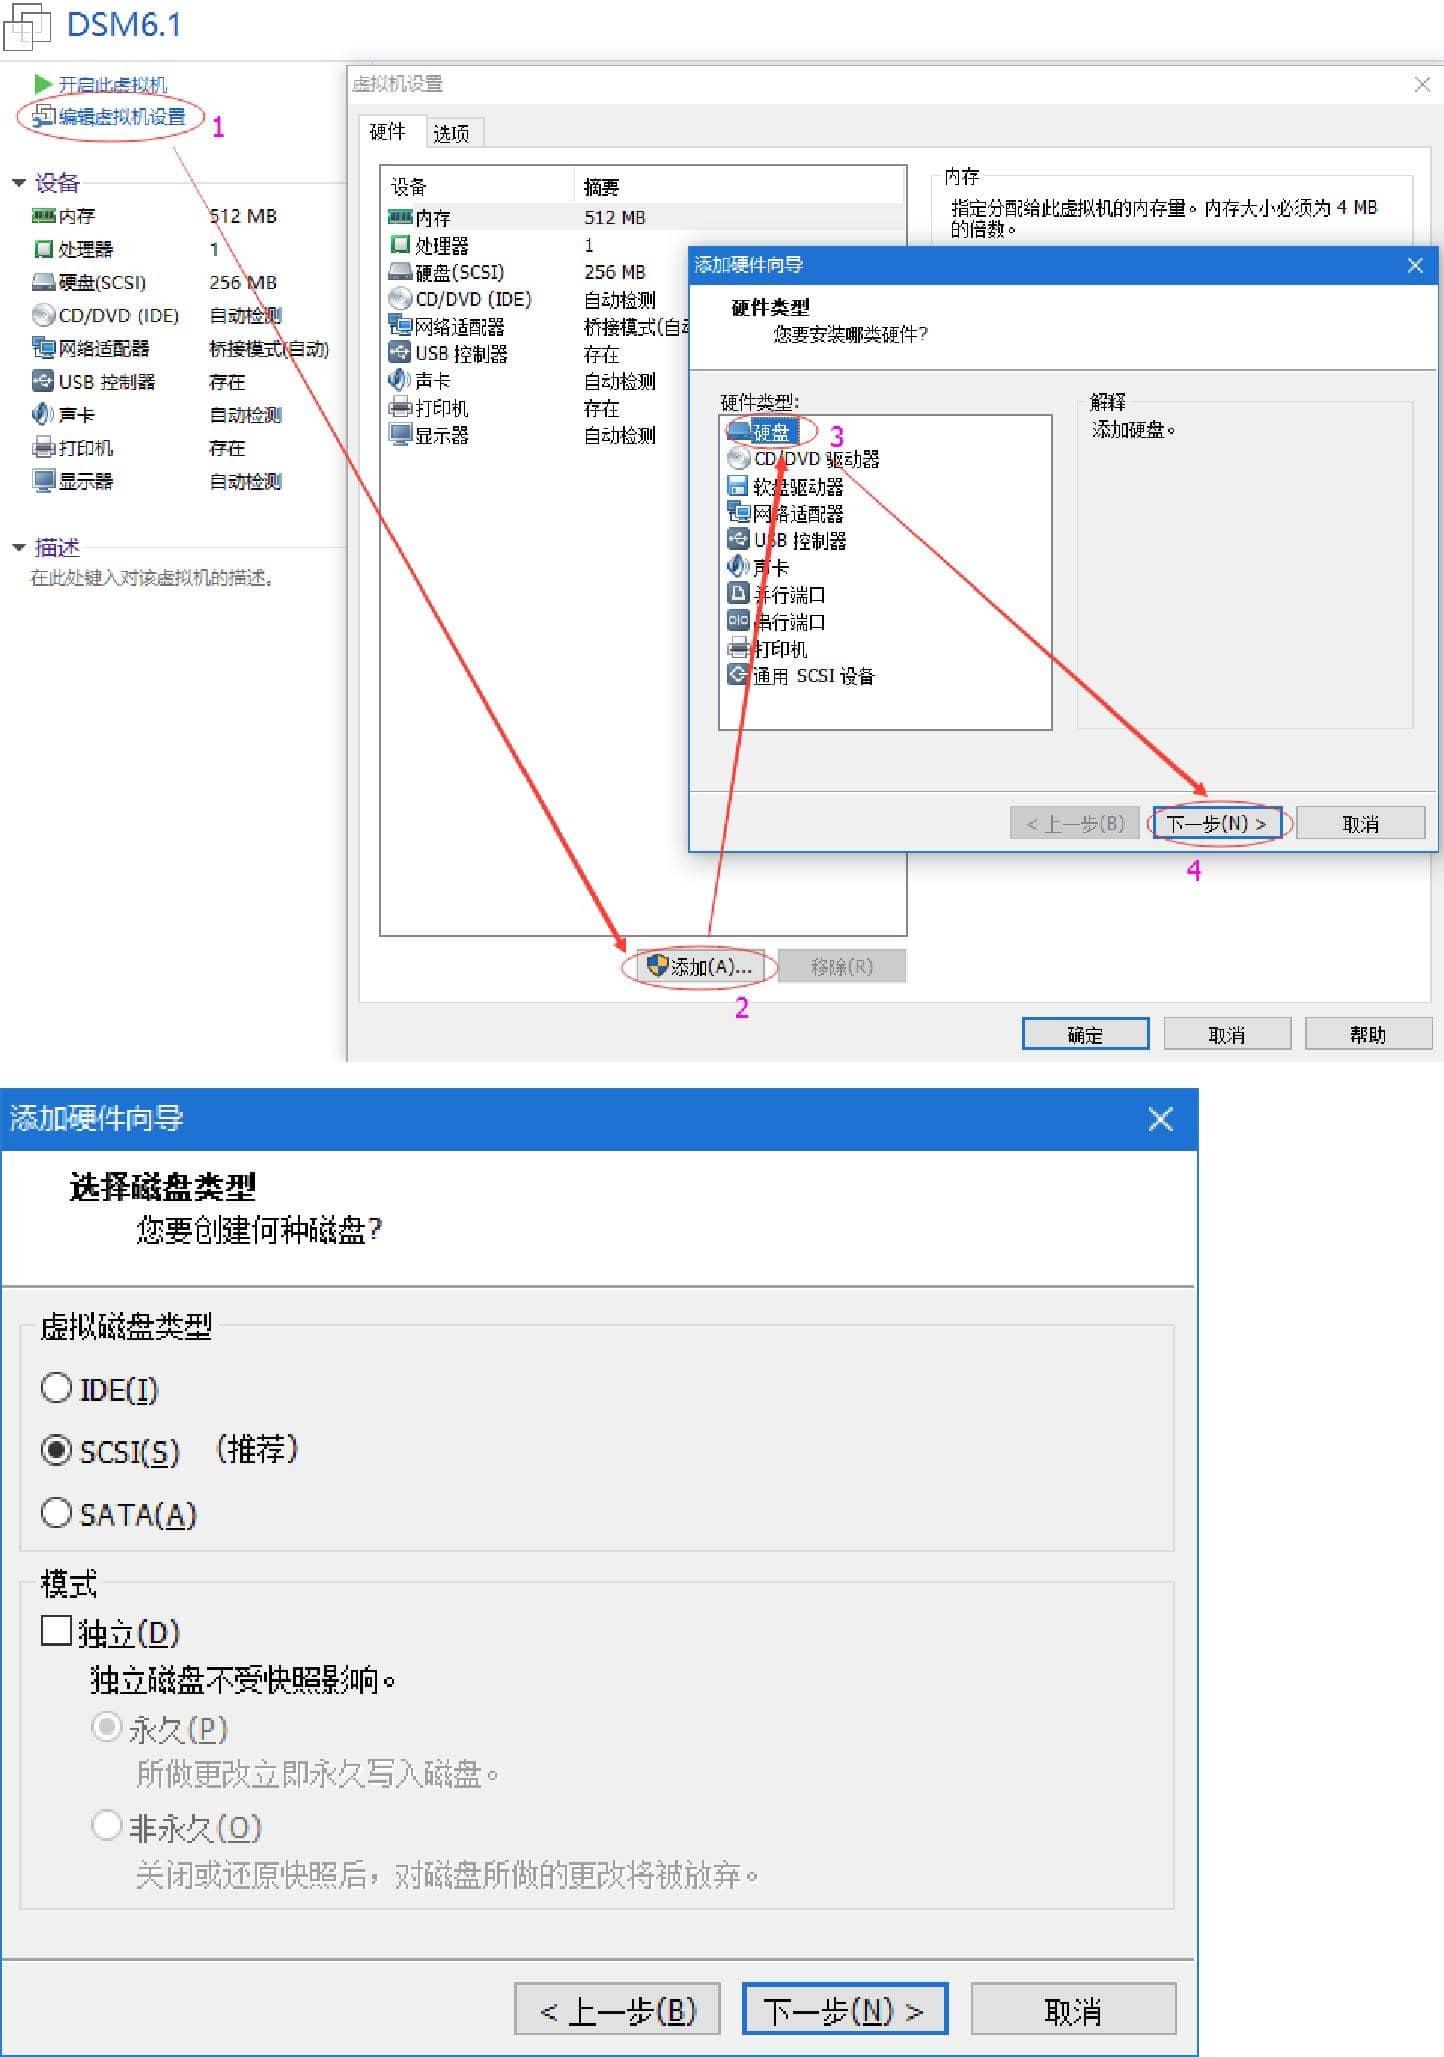 VMWare虚拟机安装黑群晖 (DSM6.1) 教程 第16张